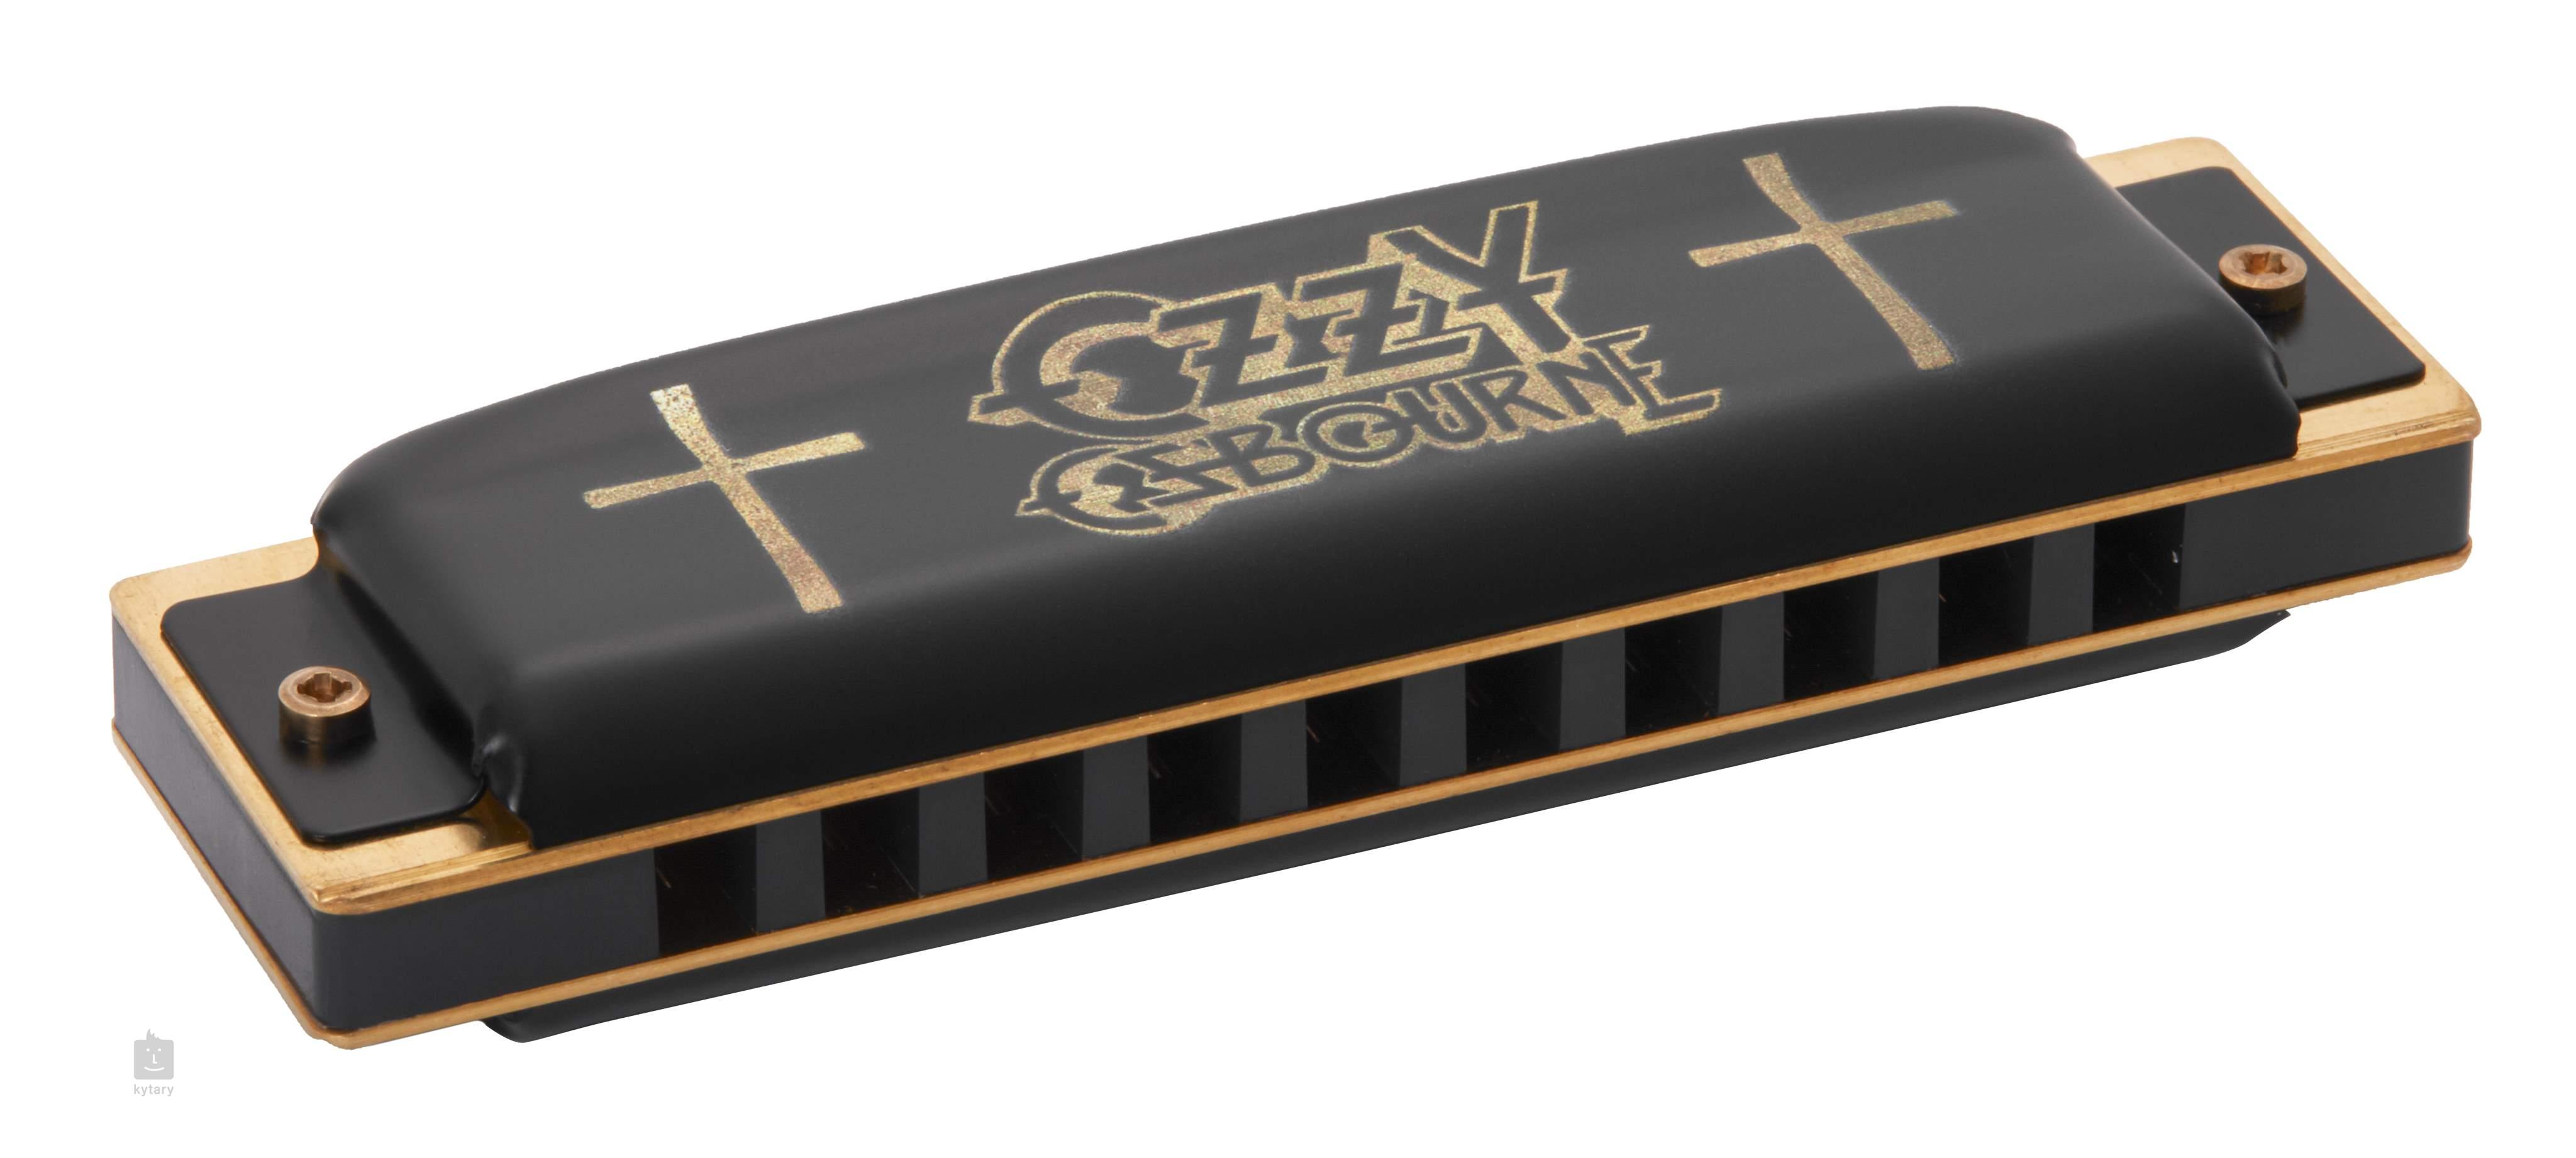 hohner ozzy osbourne signature series c signature harmonica. Black Bedroom Furniture Sets. Home Design Ideas